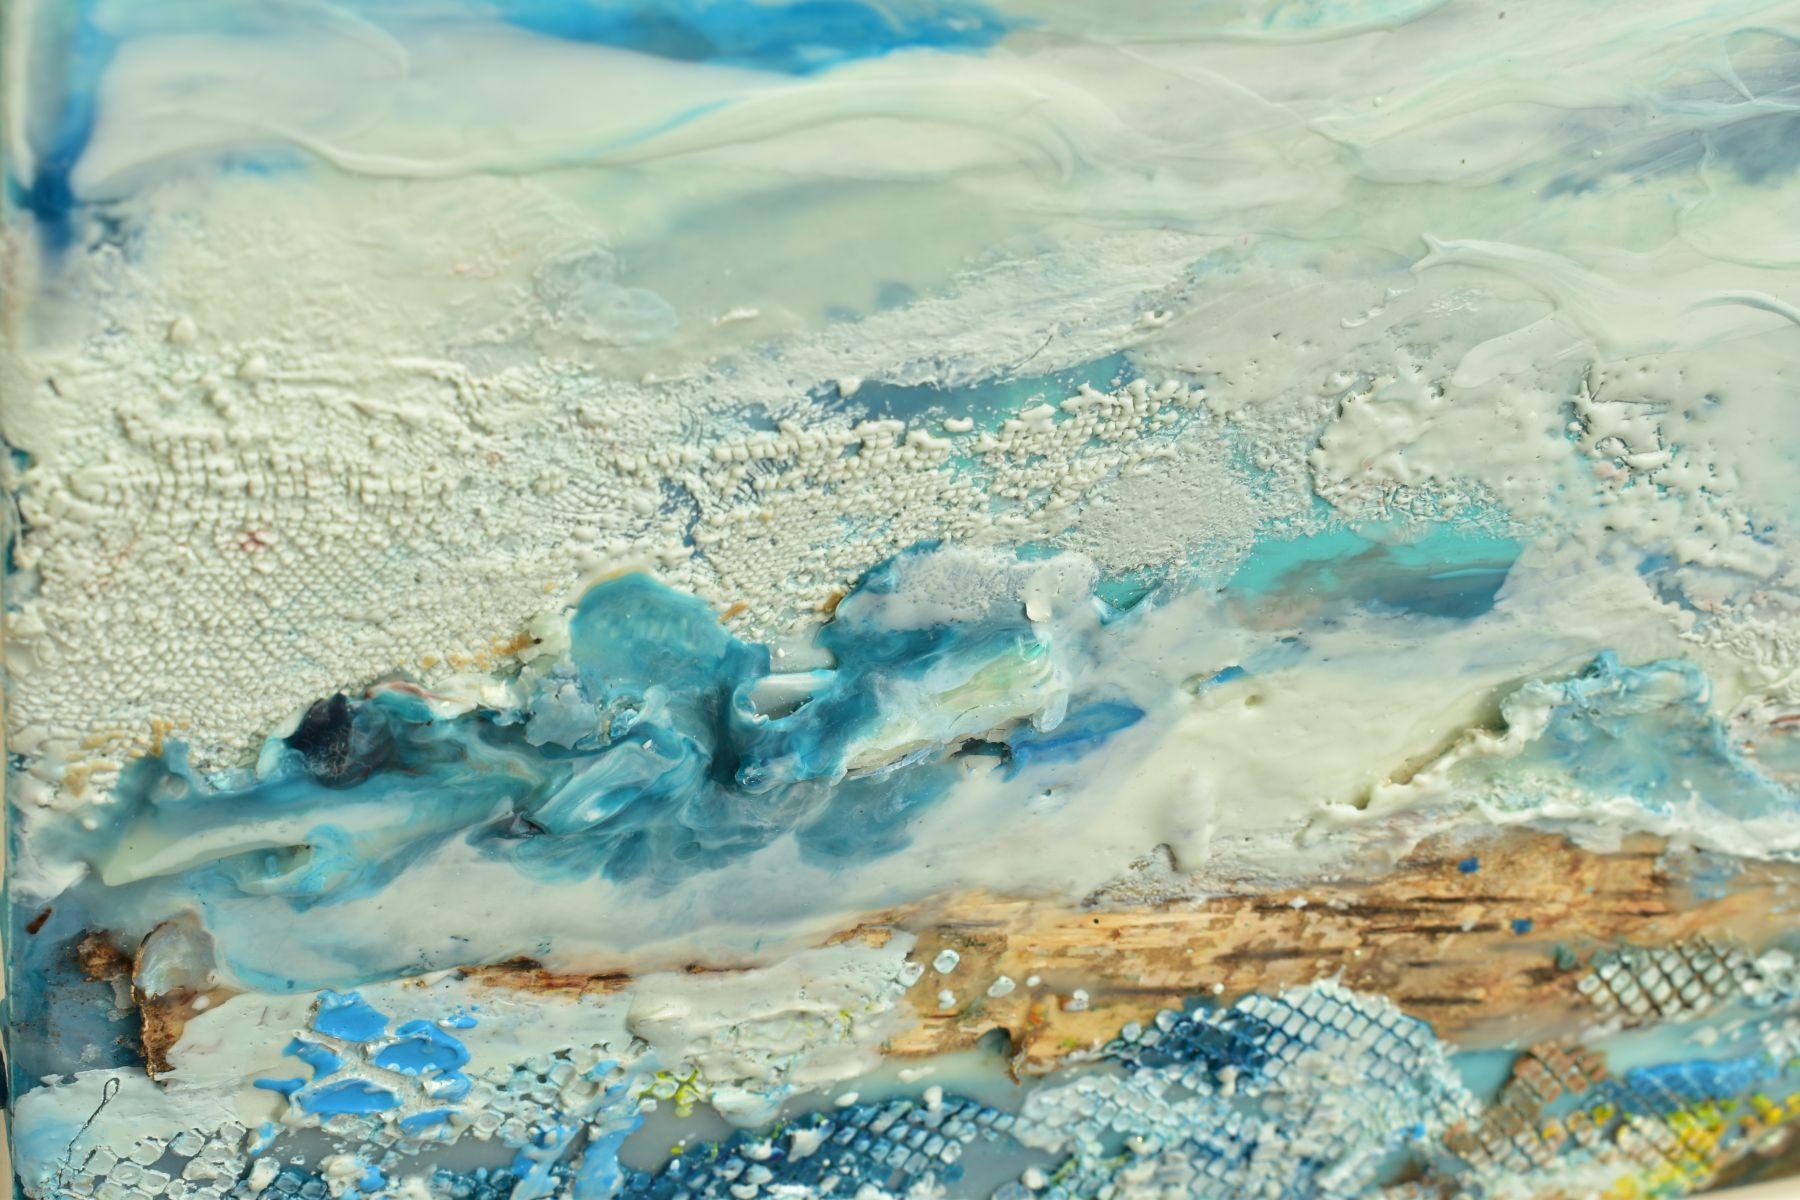 JENNINE PARKER (BRITISH 1971), 'Sea of Splendor', a coastal seascape, initialled bottom right, mixed - Image 6 of 7